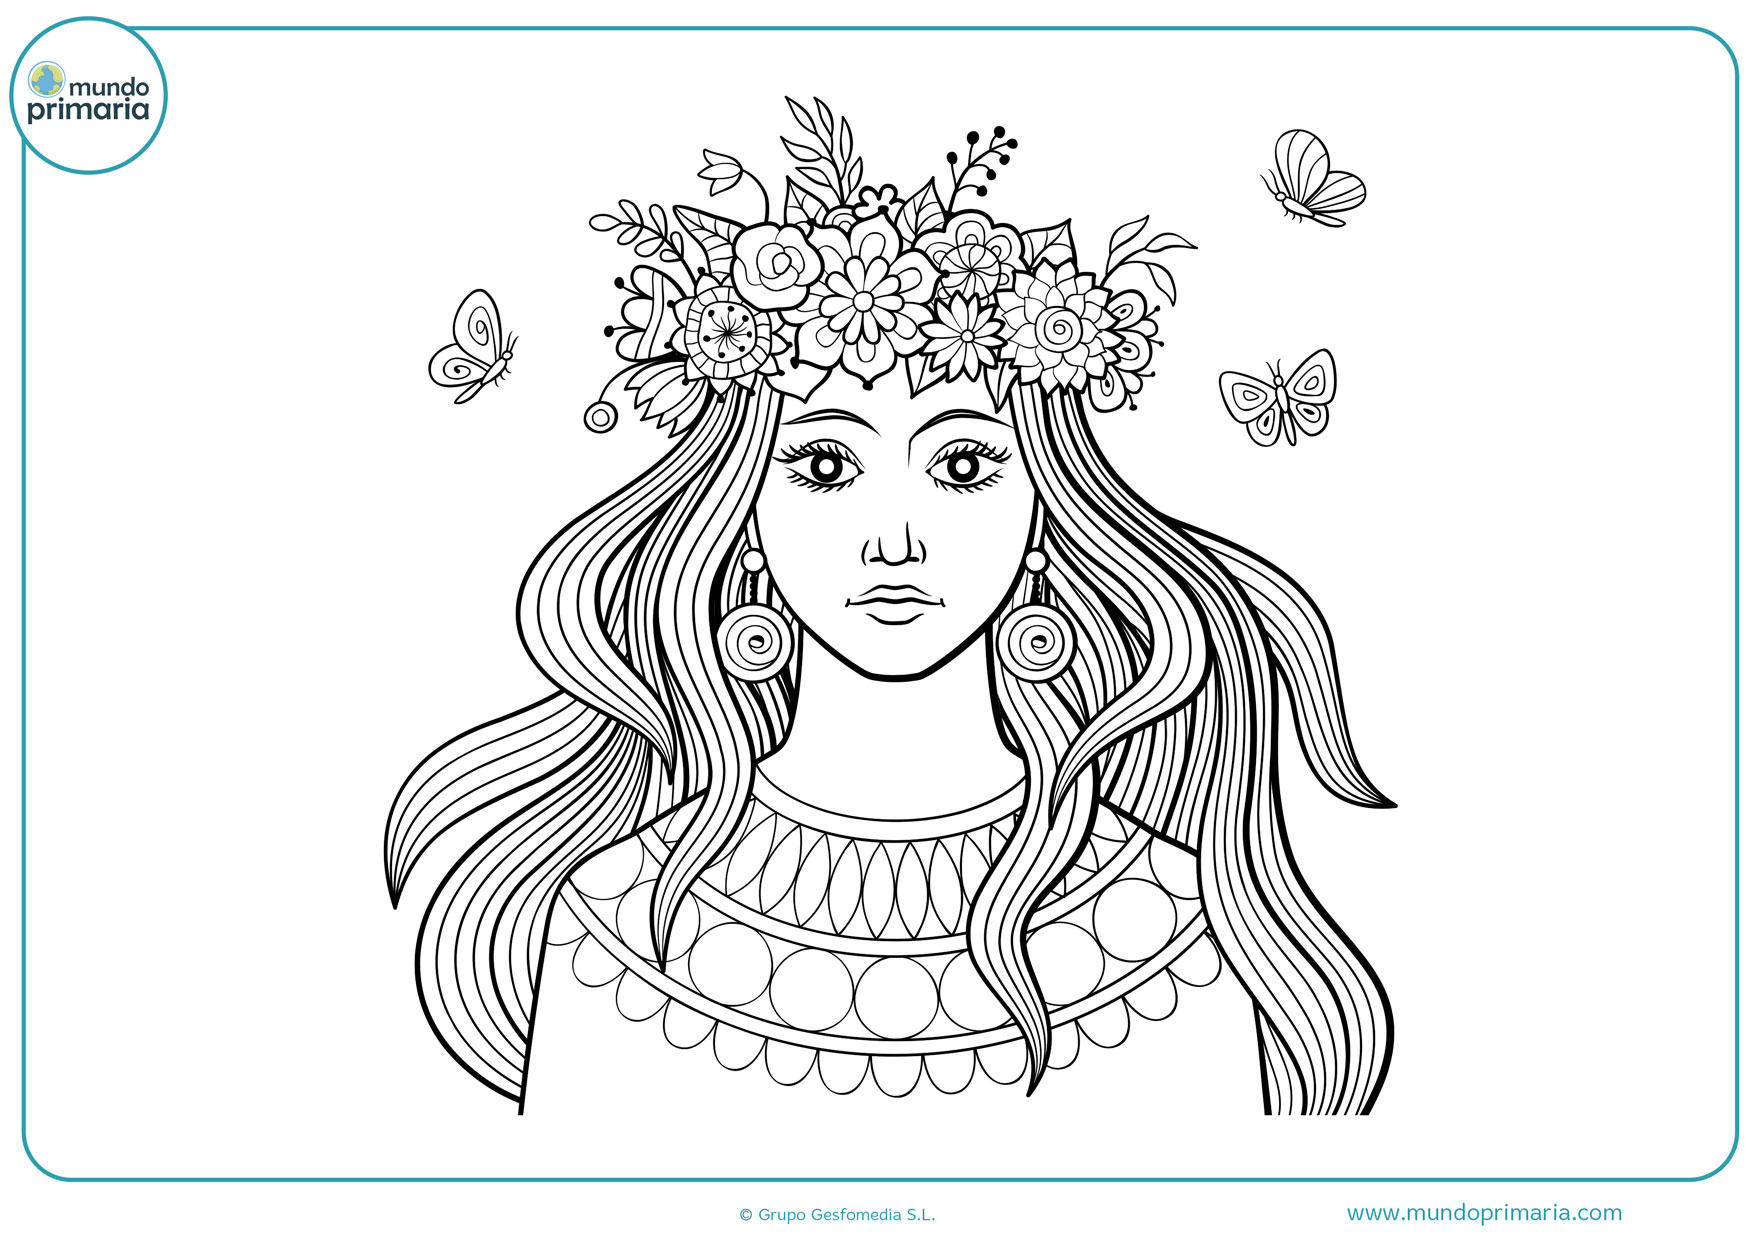 dibujos de personas para colorear e imprimir